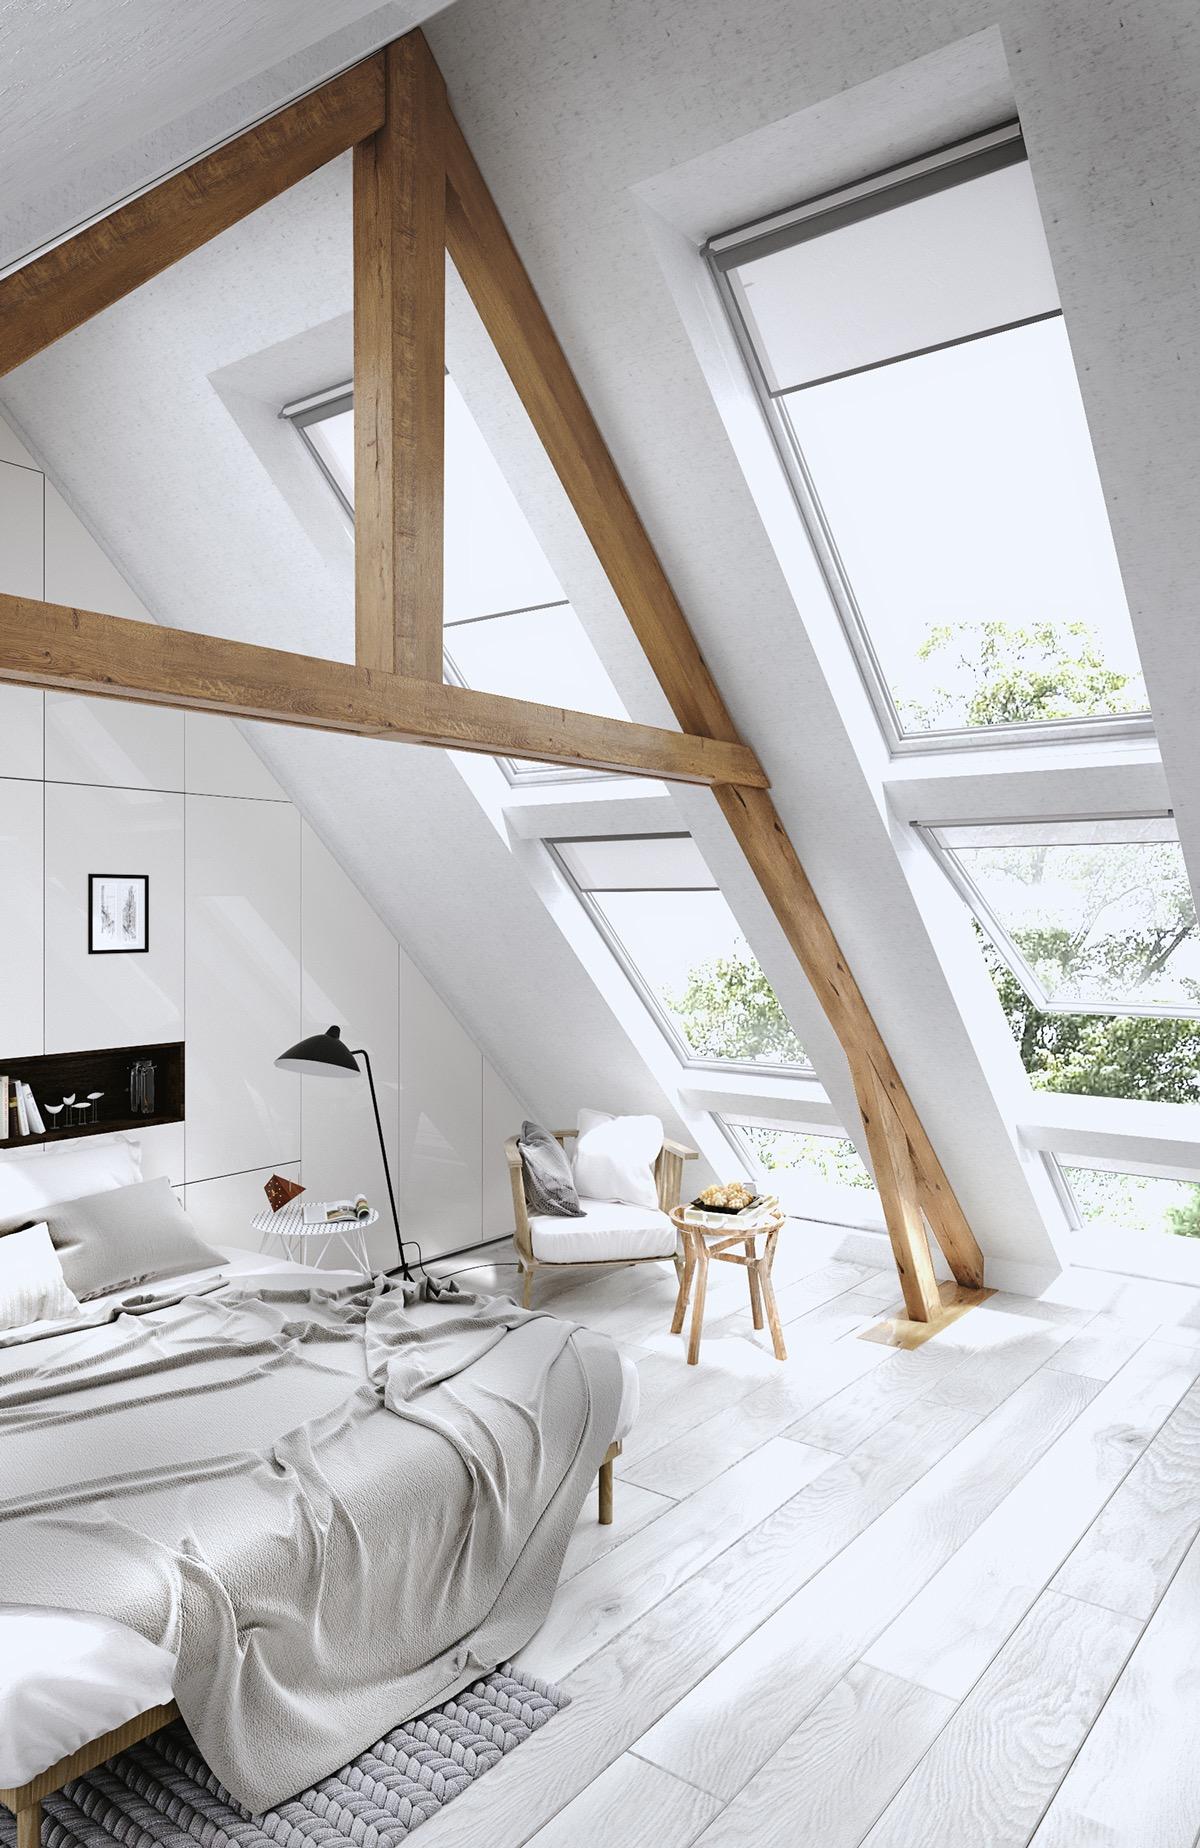 Attic Bedroom with Big Skylight